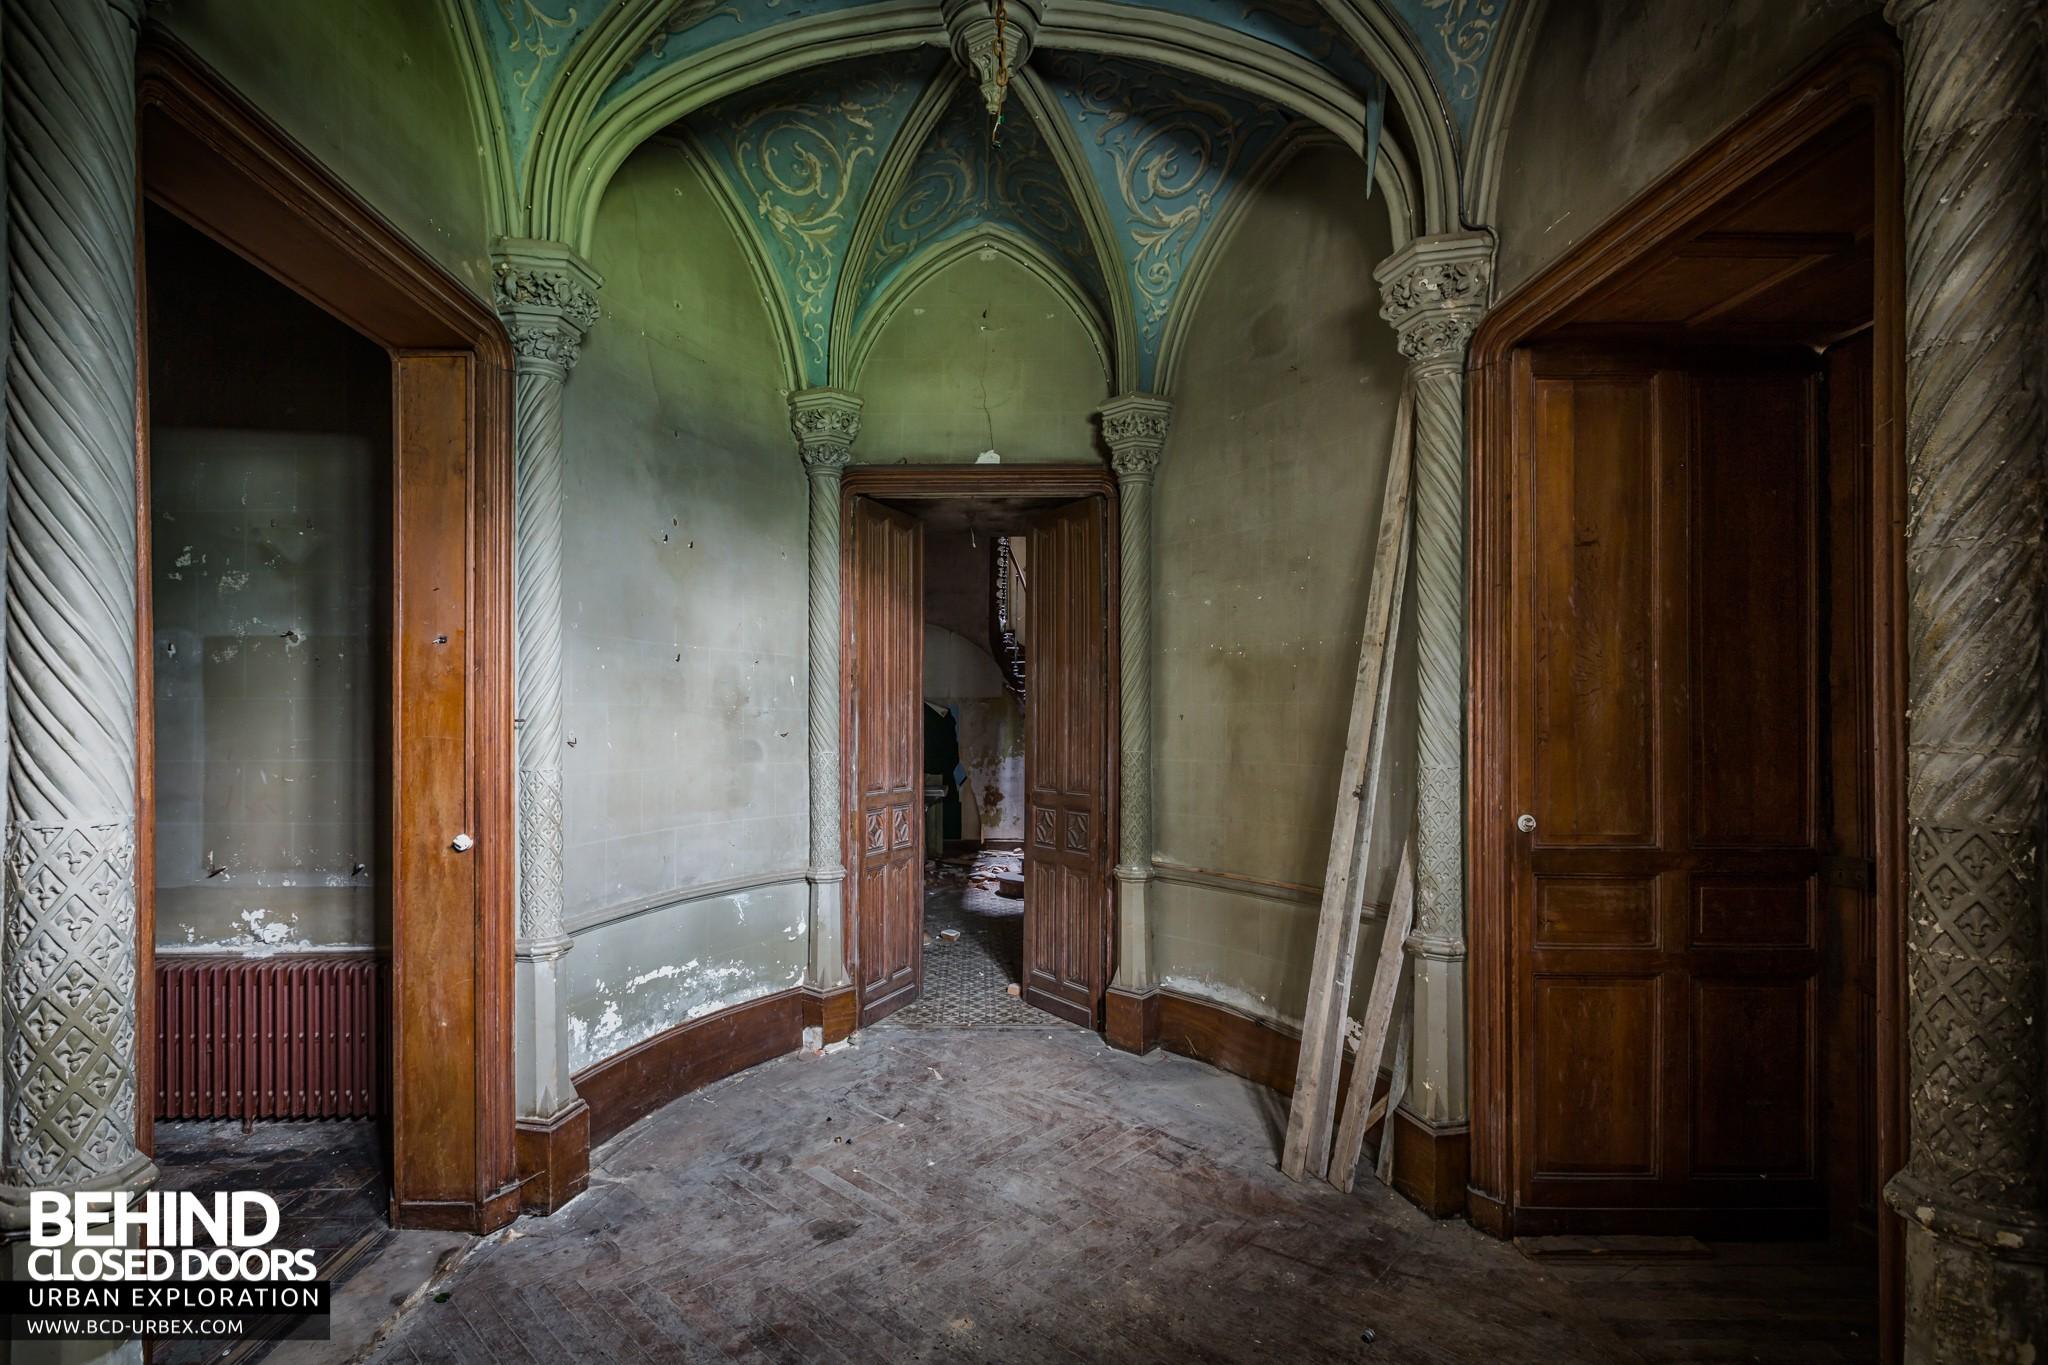 Château des Chimères France \u2013 Doors and arched ceiling in hallway & Château des Chimères France » Urbex | Behind Closed Doors Urban ...